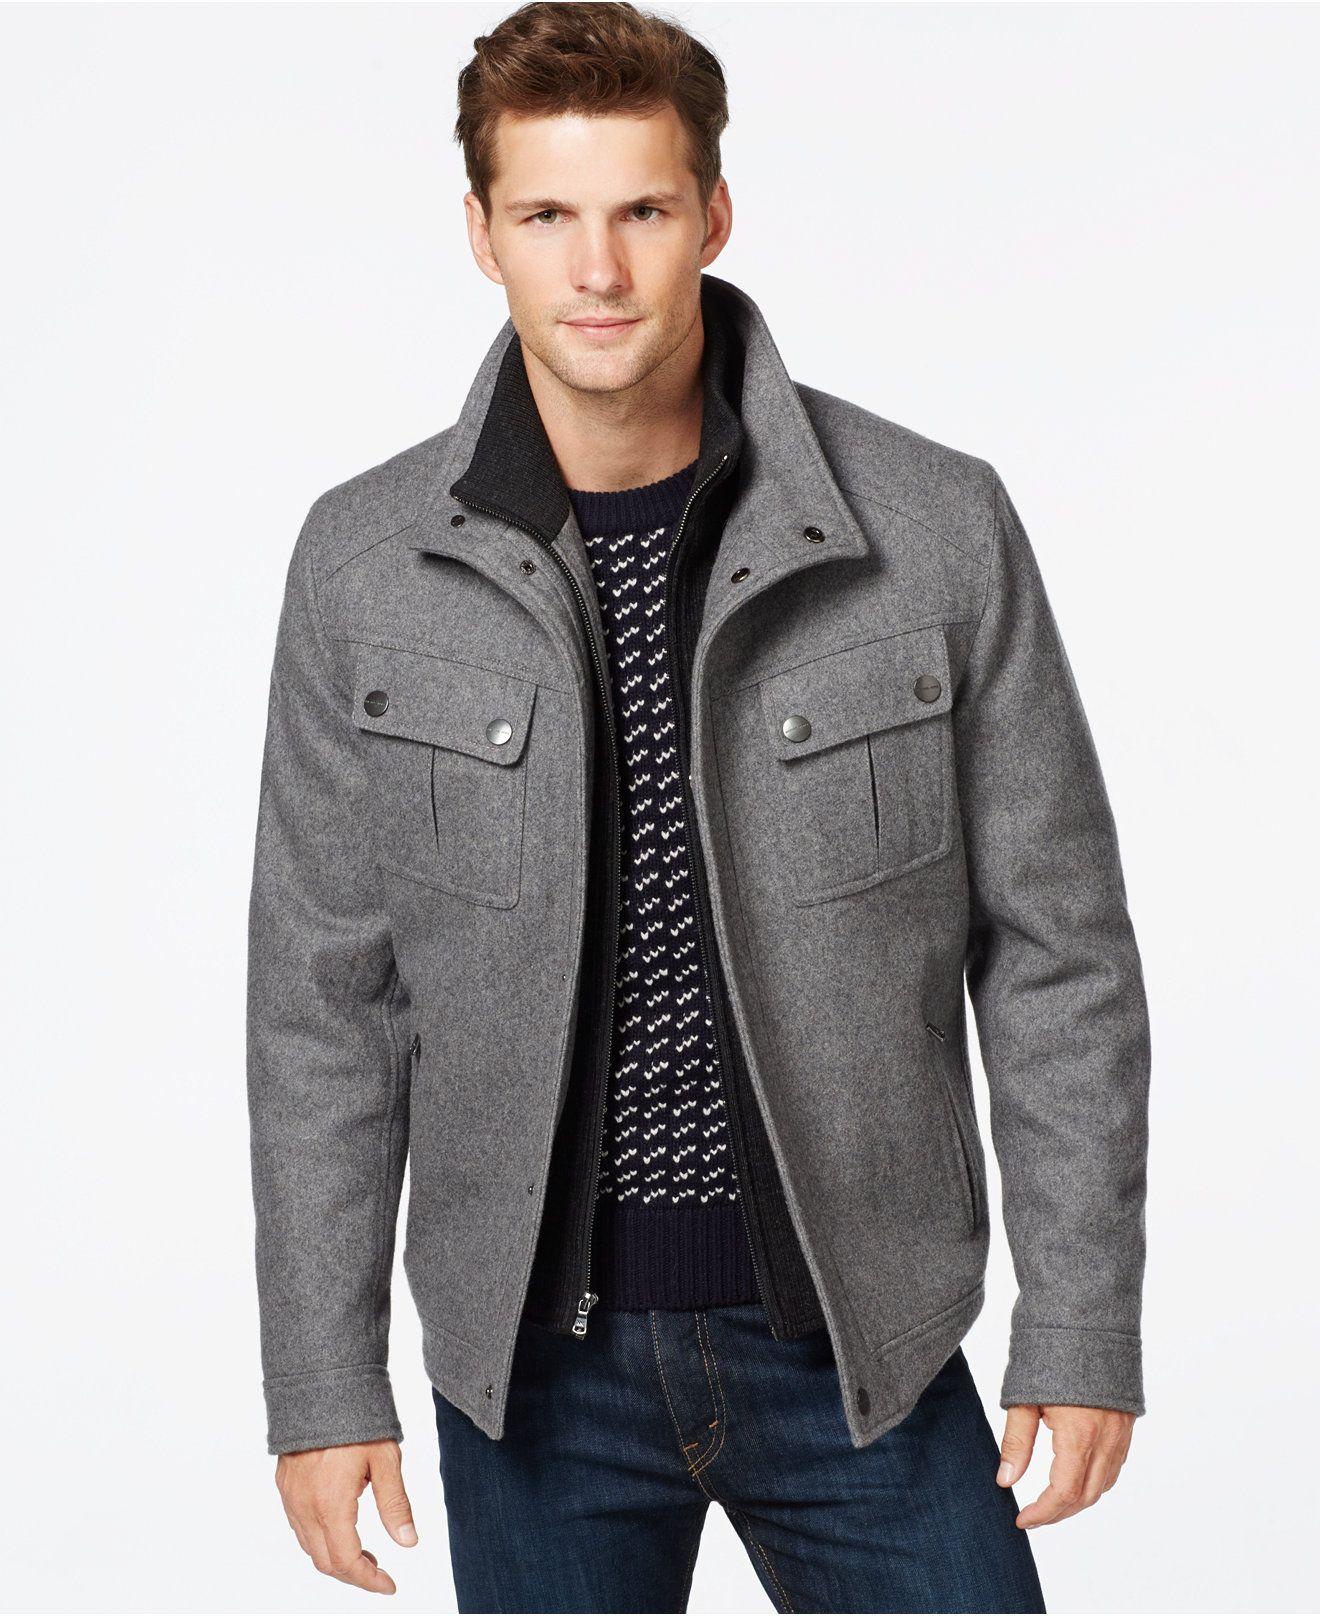 Mens jacket online - Michael Michael Kors Brockton Wool Blend Jacket Coats Jackets Men Macy S